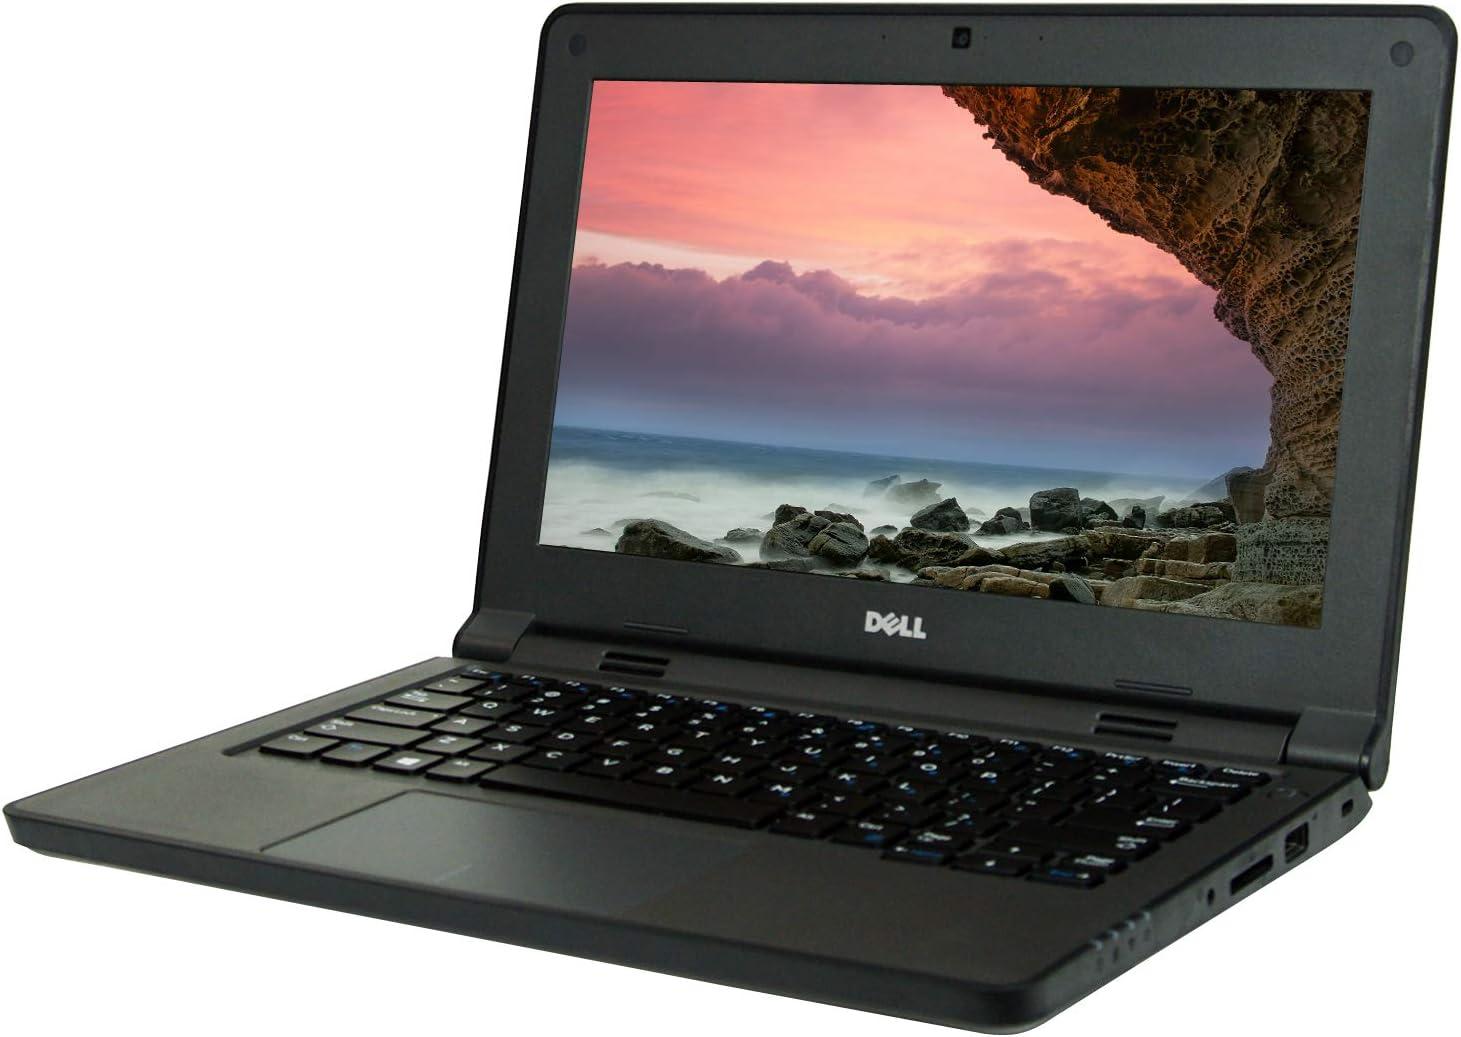 Dell Latitude 3150 11.6 HD Laptop, Celeron N2840 2.16GHz, 4GB, 128GB Solid State Drive, Windows 10 Pro 64Bit, CAM, (Renewed)